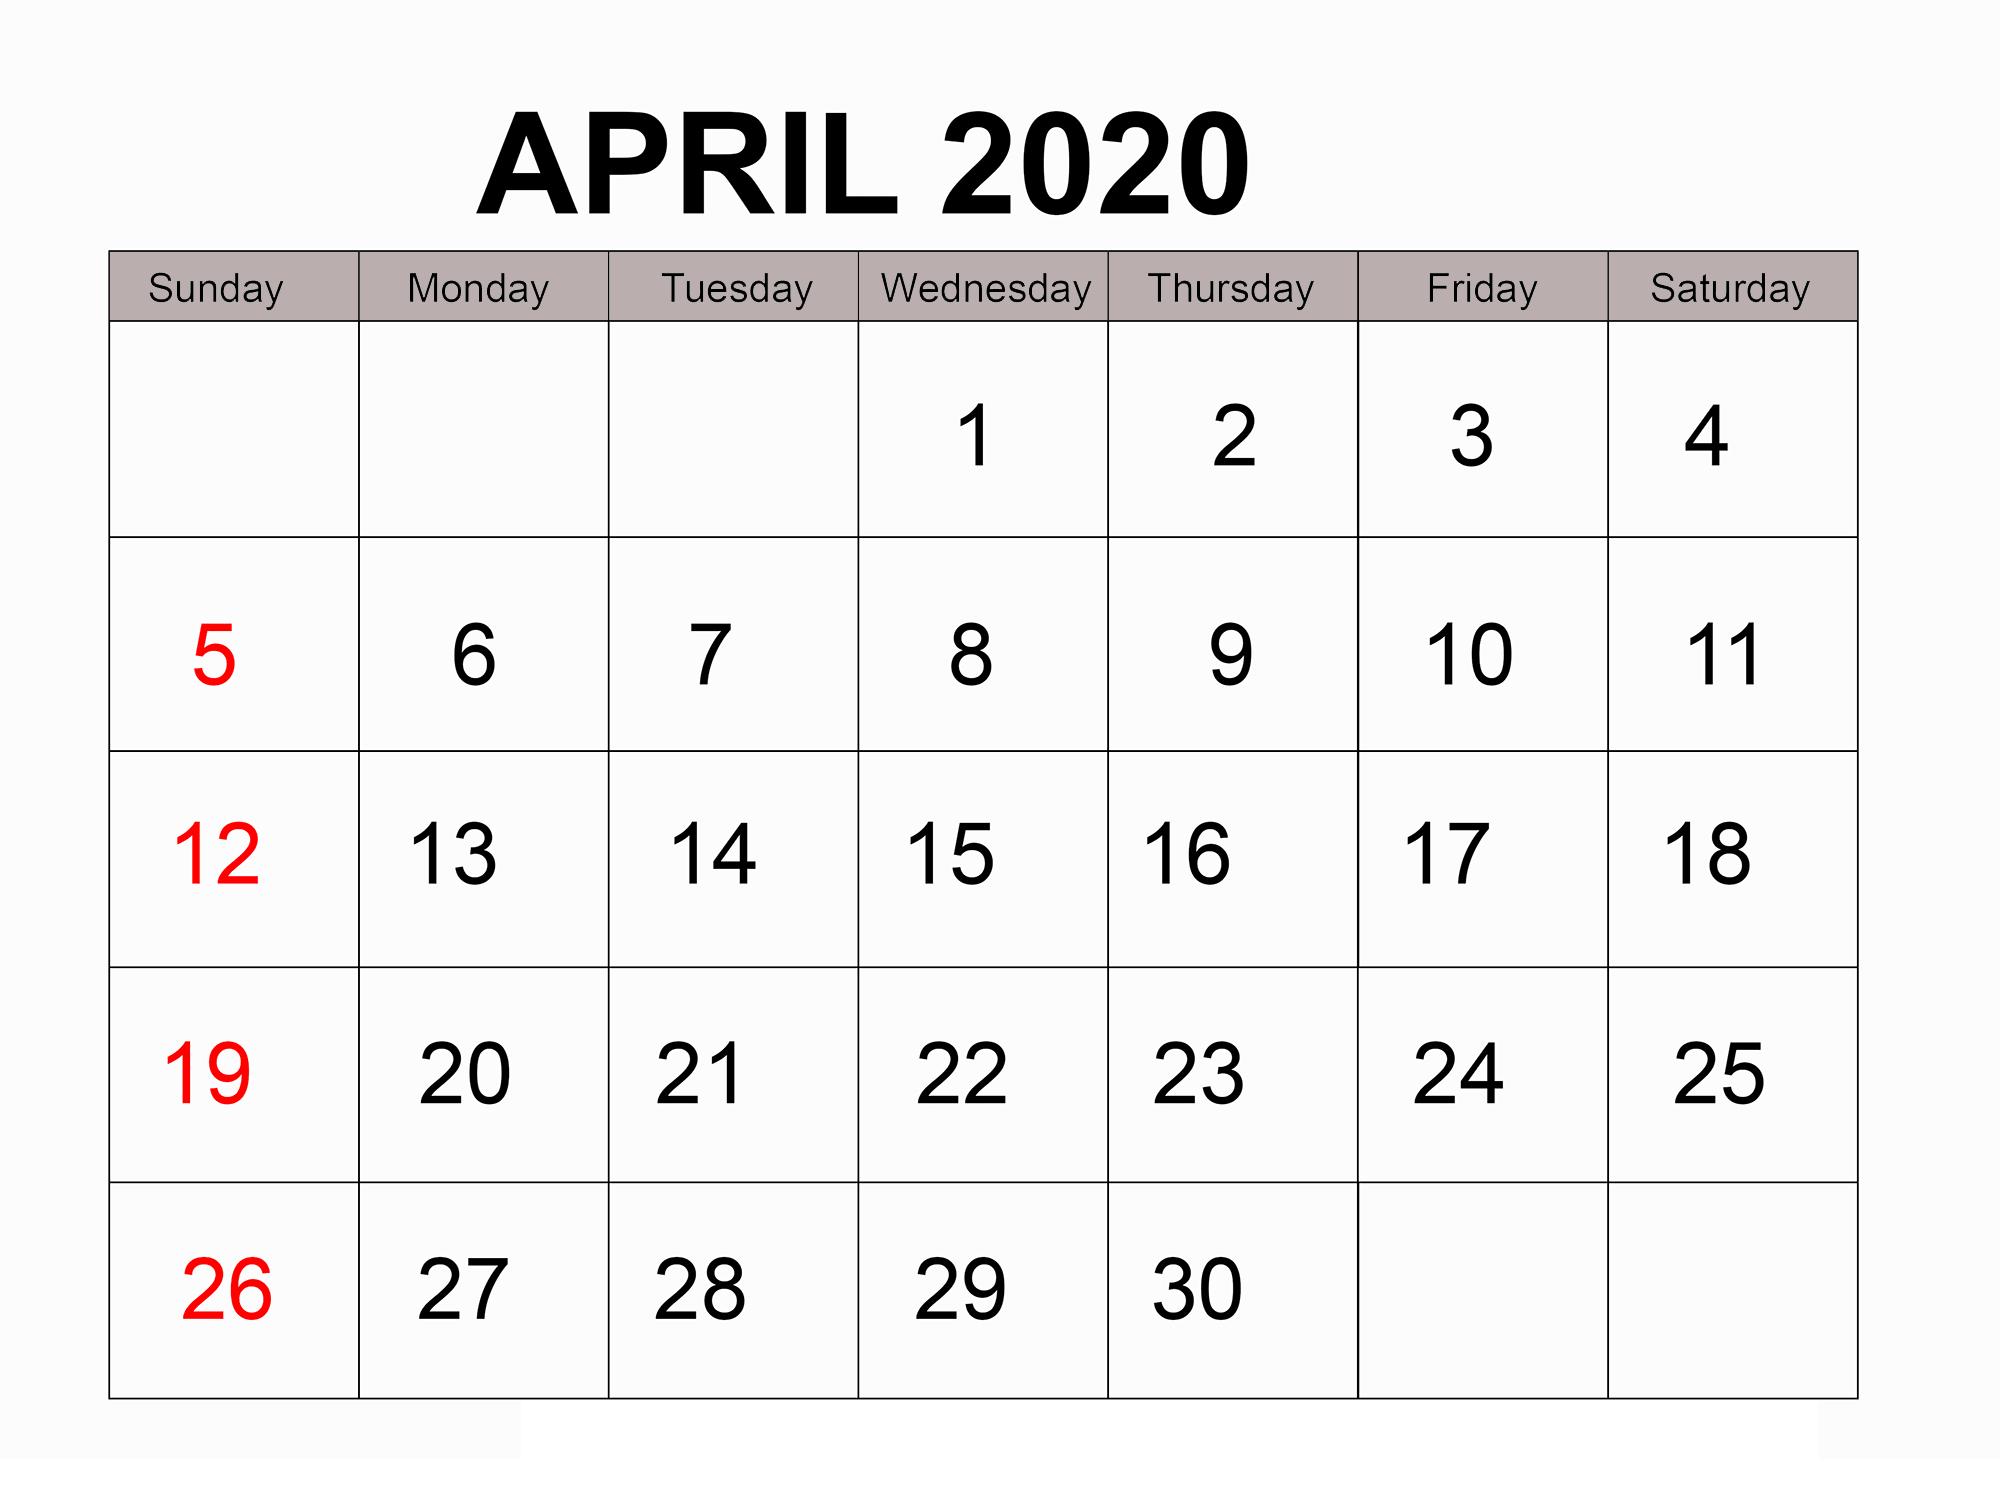 Blank Calendar Page For April 2020 | Free Printable Calendar